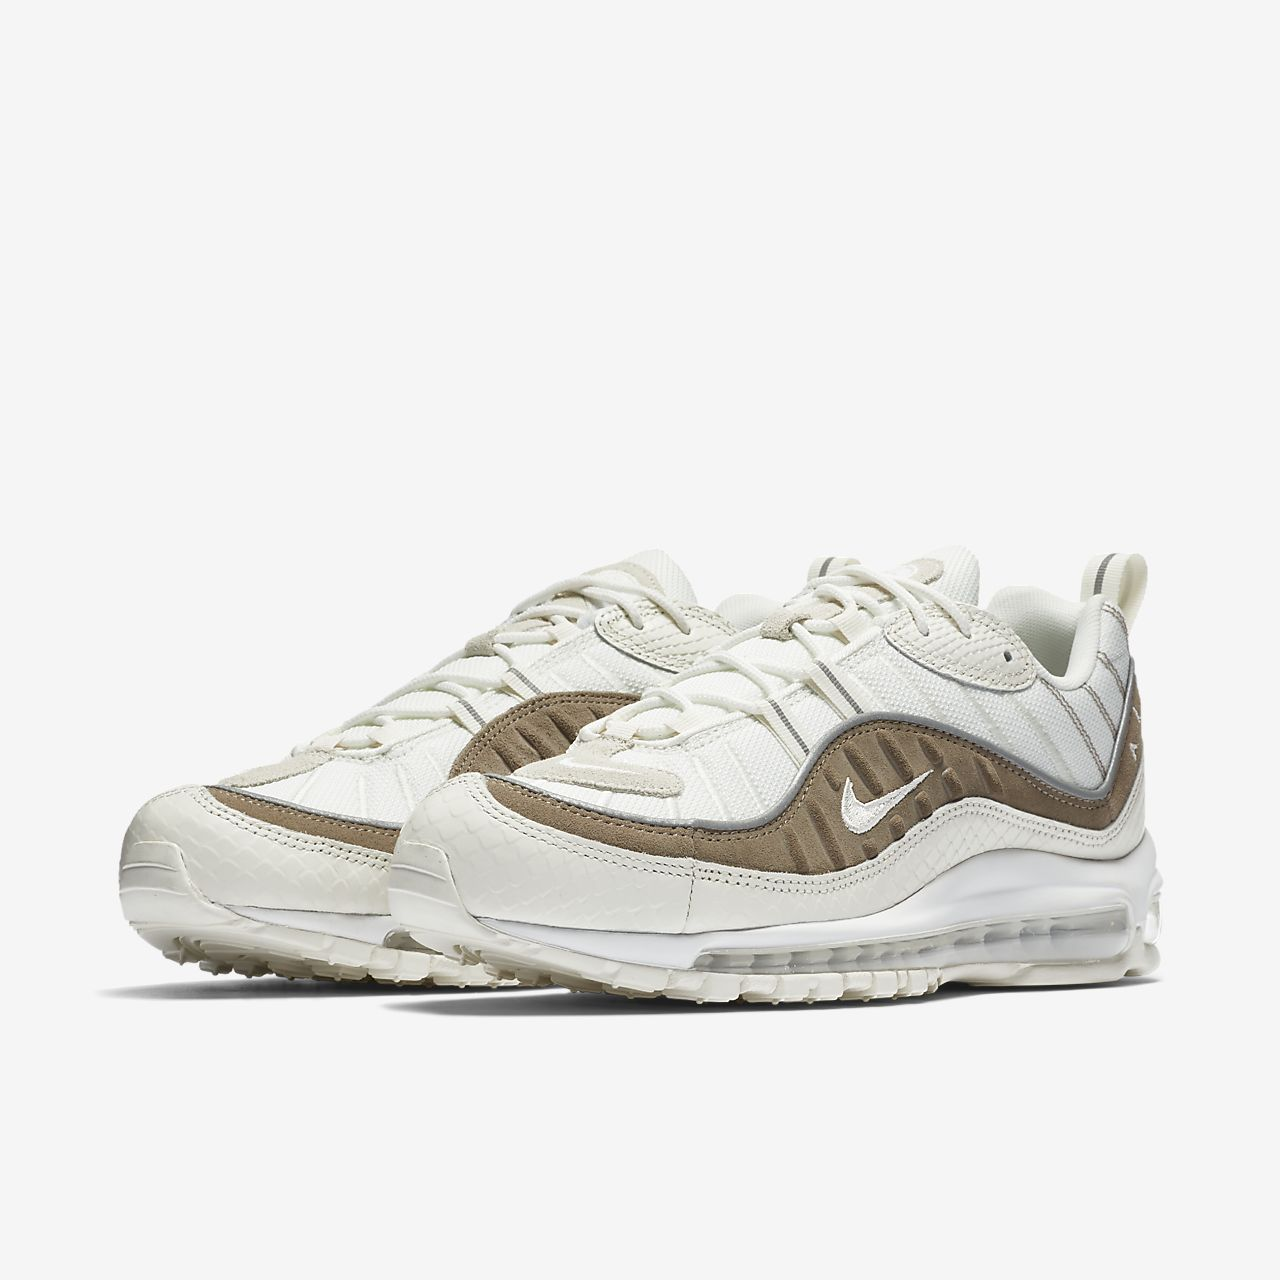 scarpe 98 nike